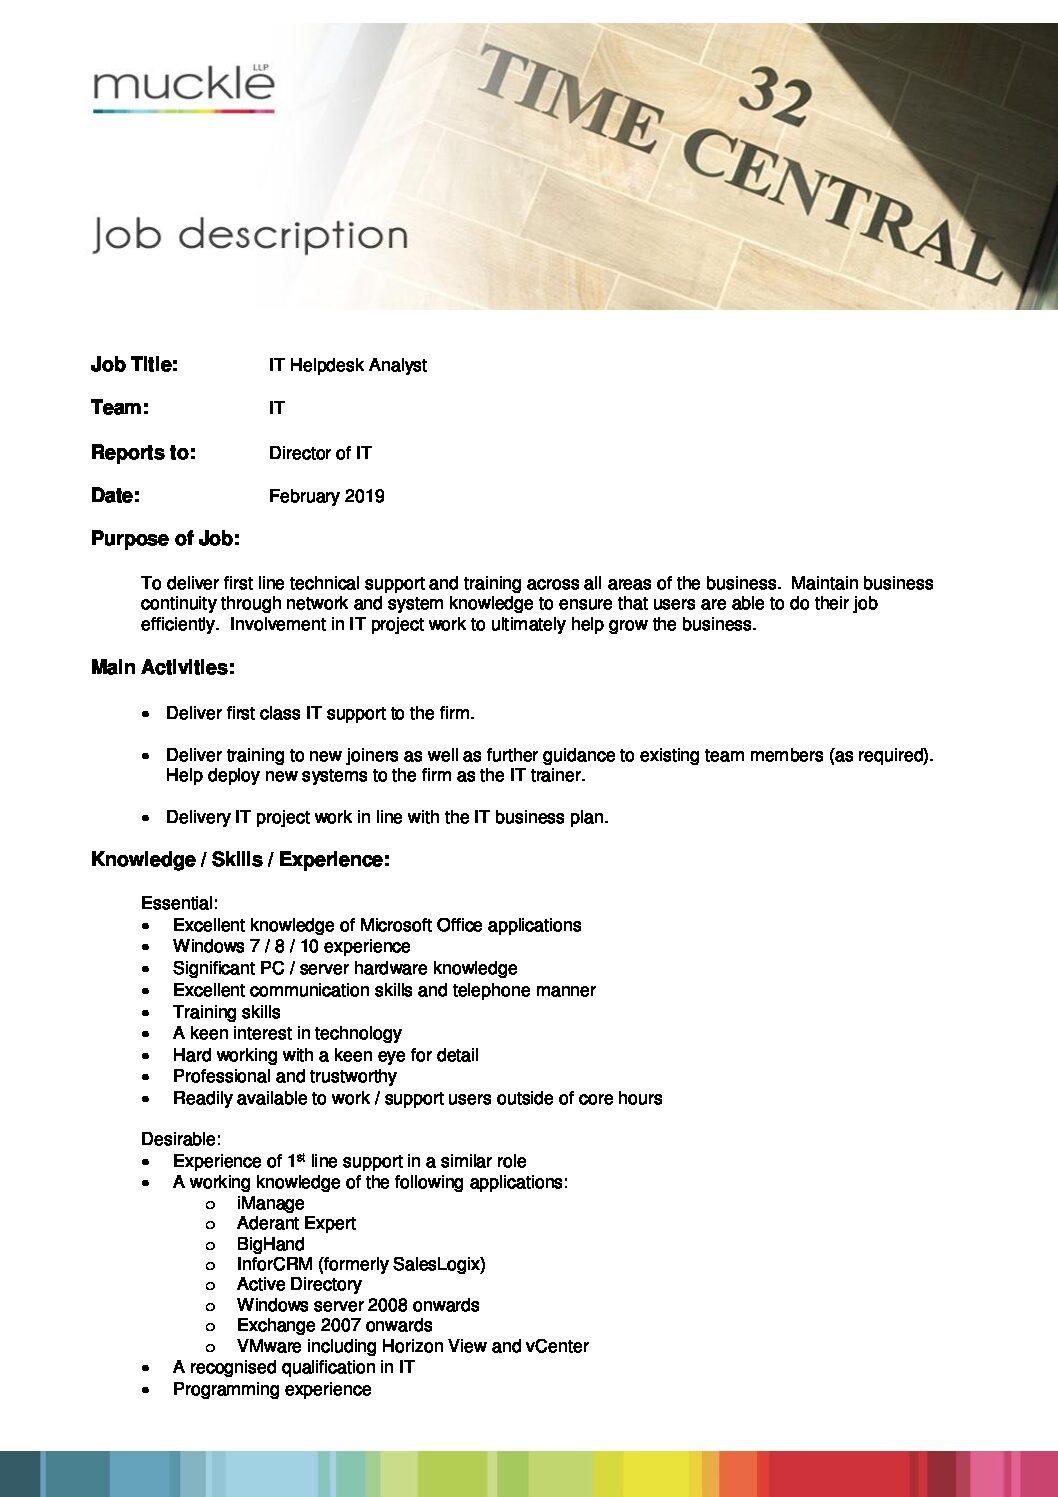 IT Helpdesk Analyst job description - Muckle LLP